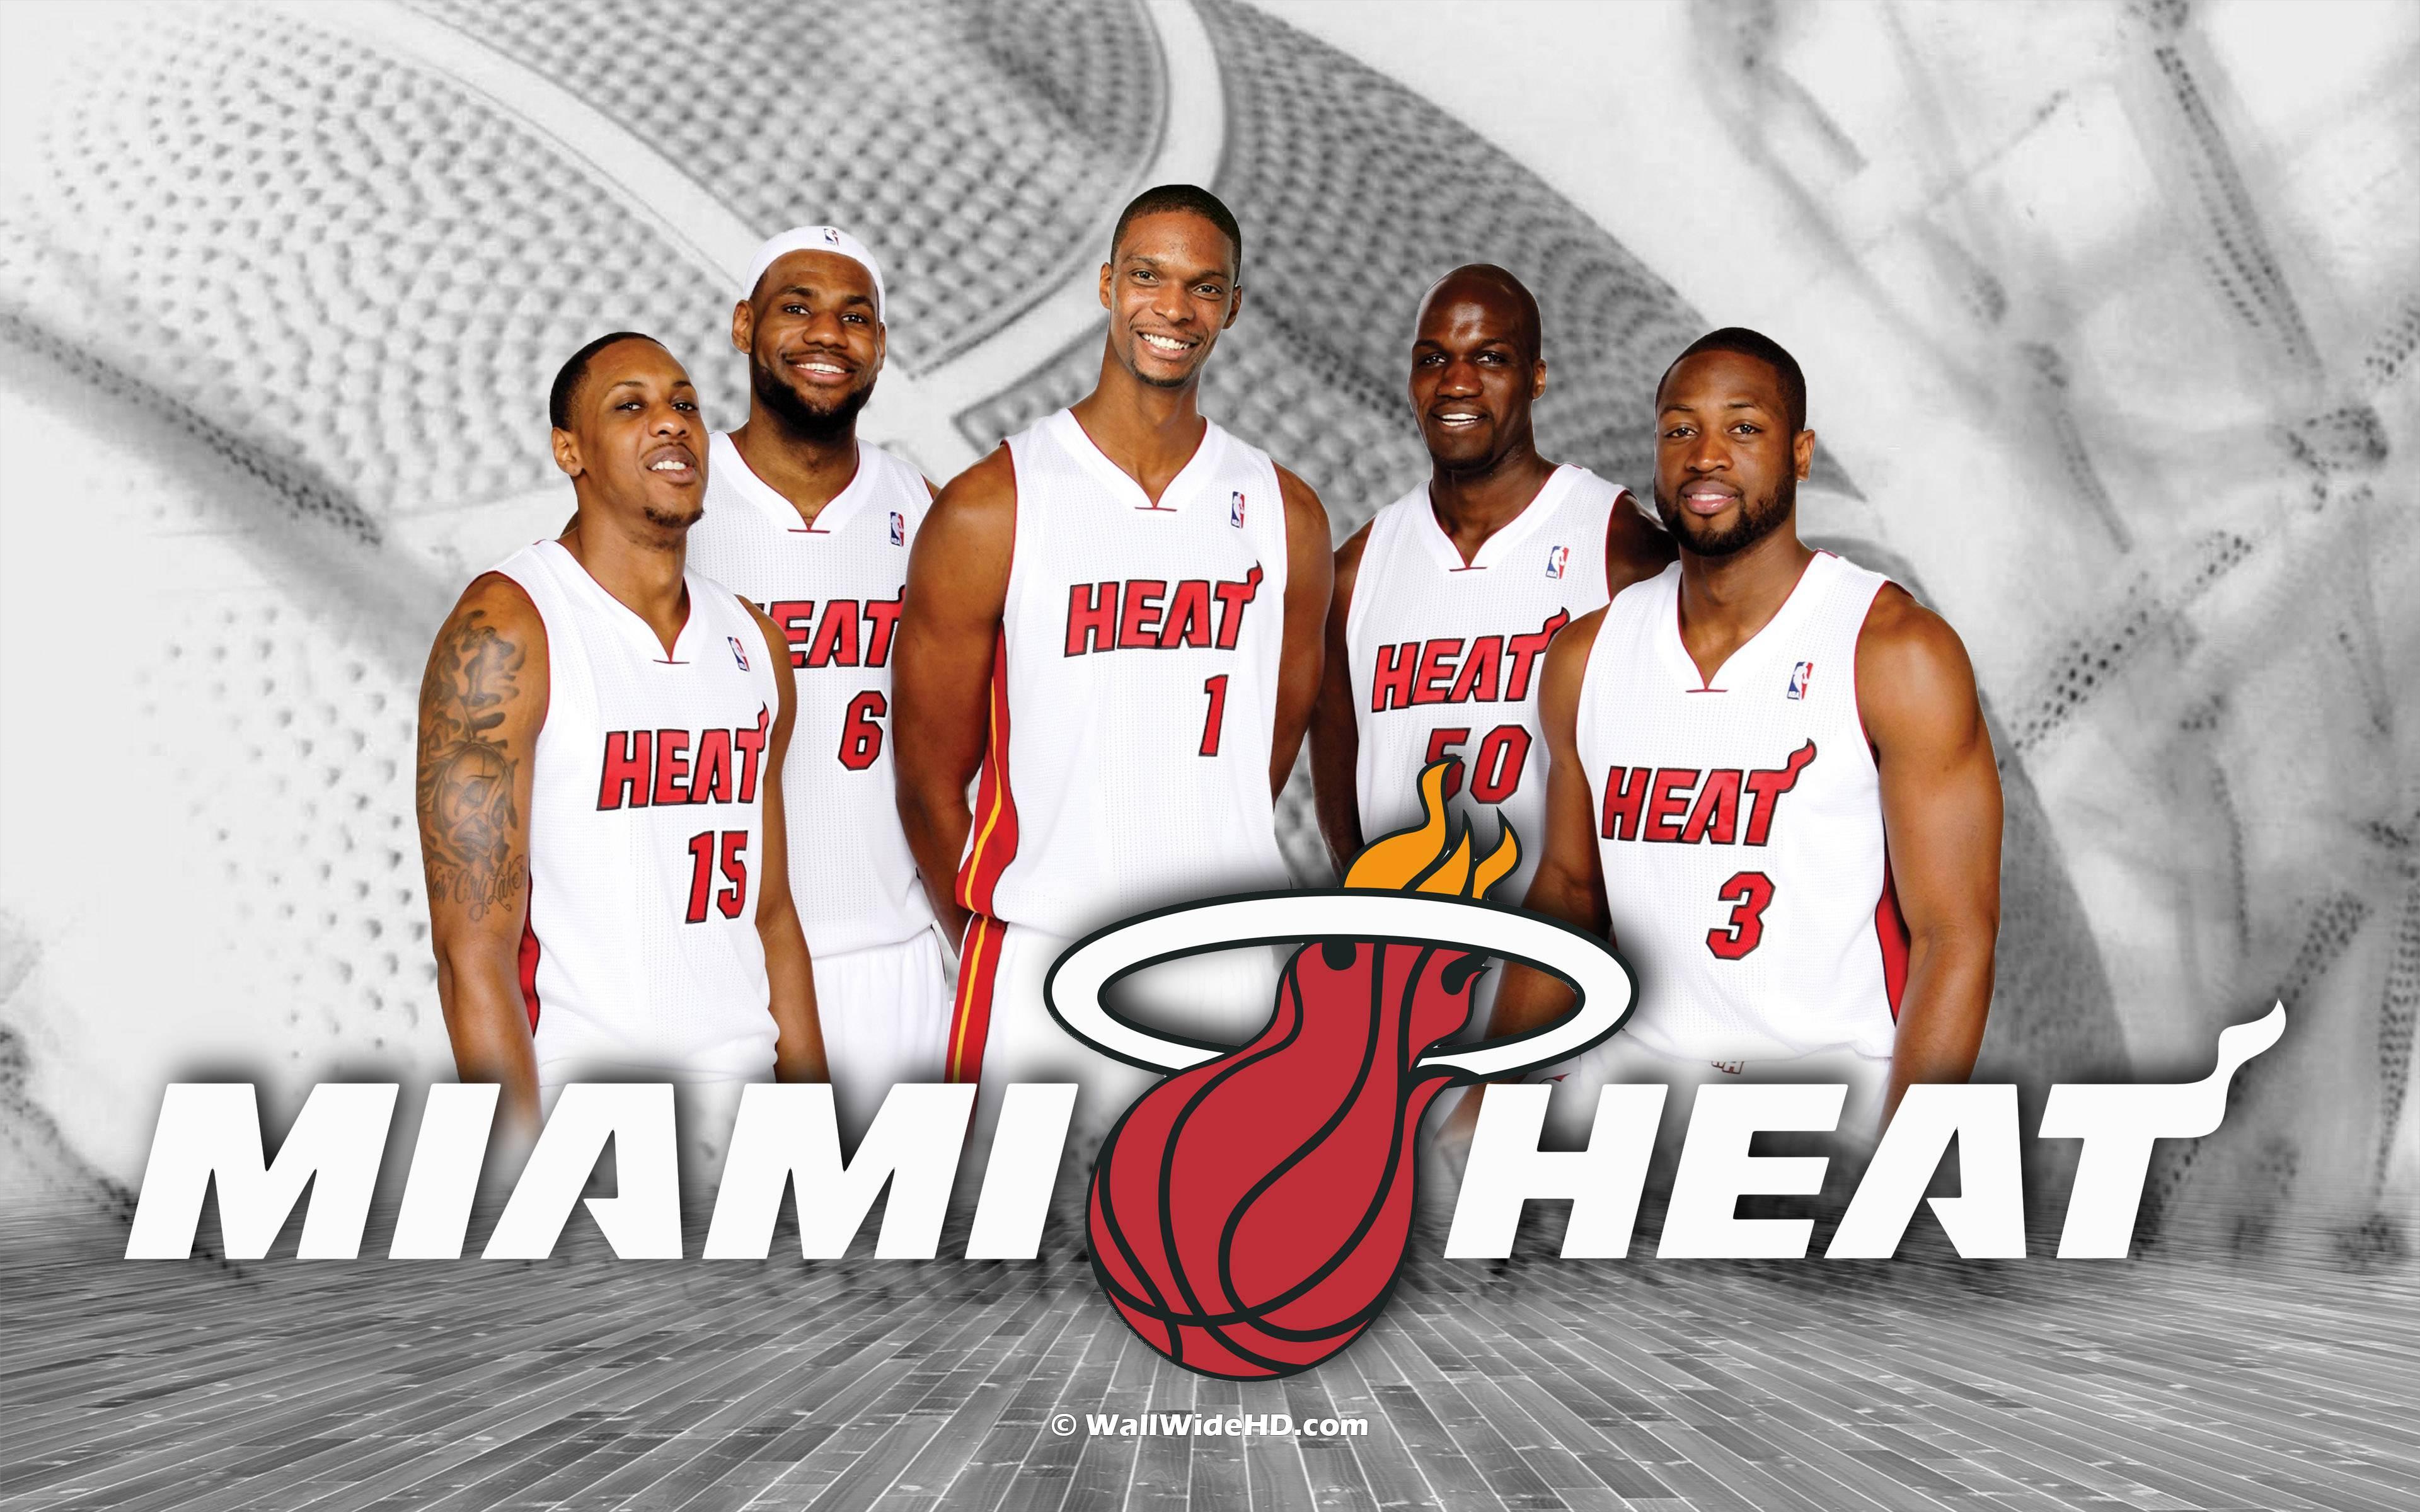 Miami heat roster nba - Miami Heat Logo Wallpapers 2015 Wallpaper Cave